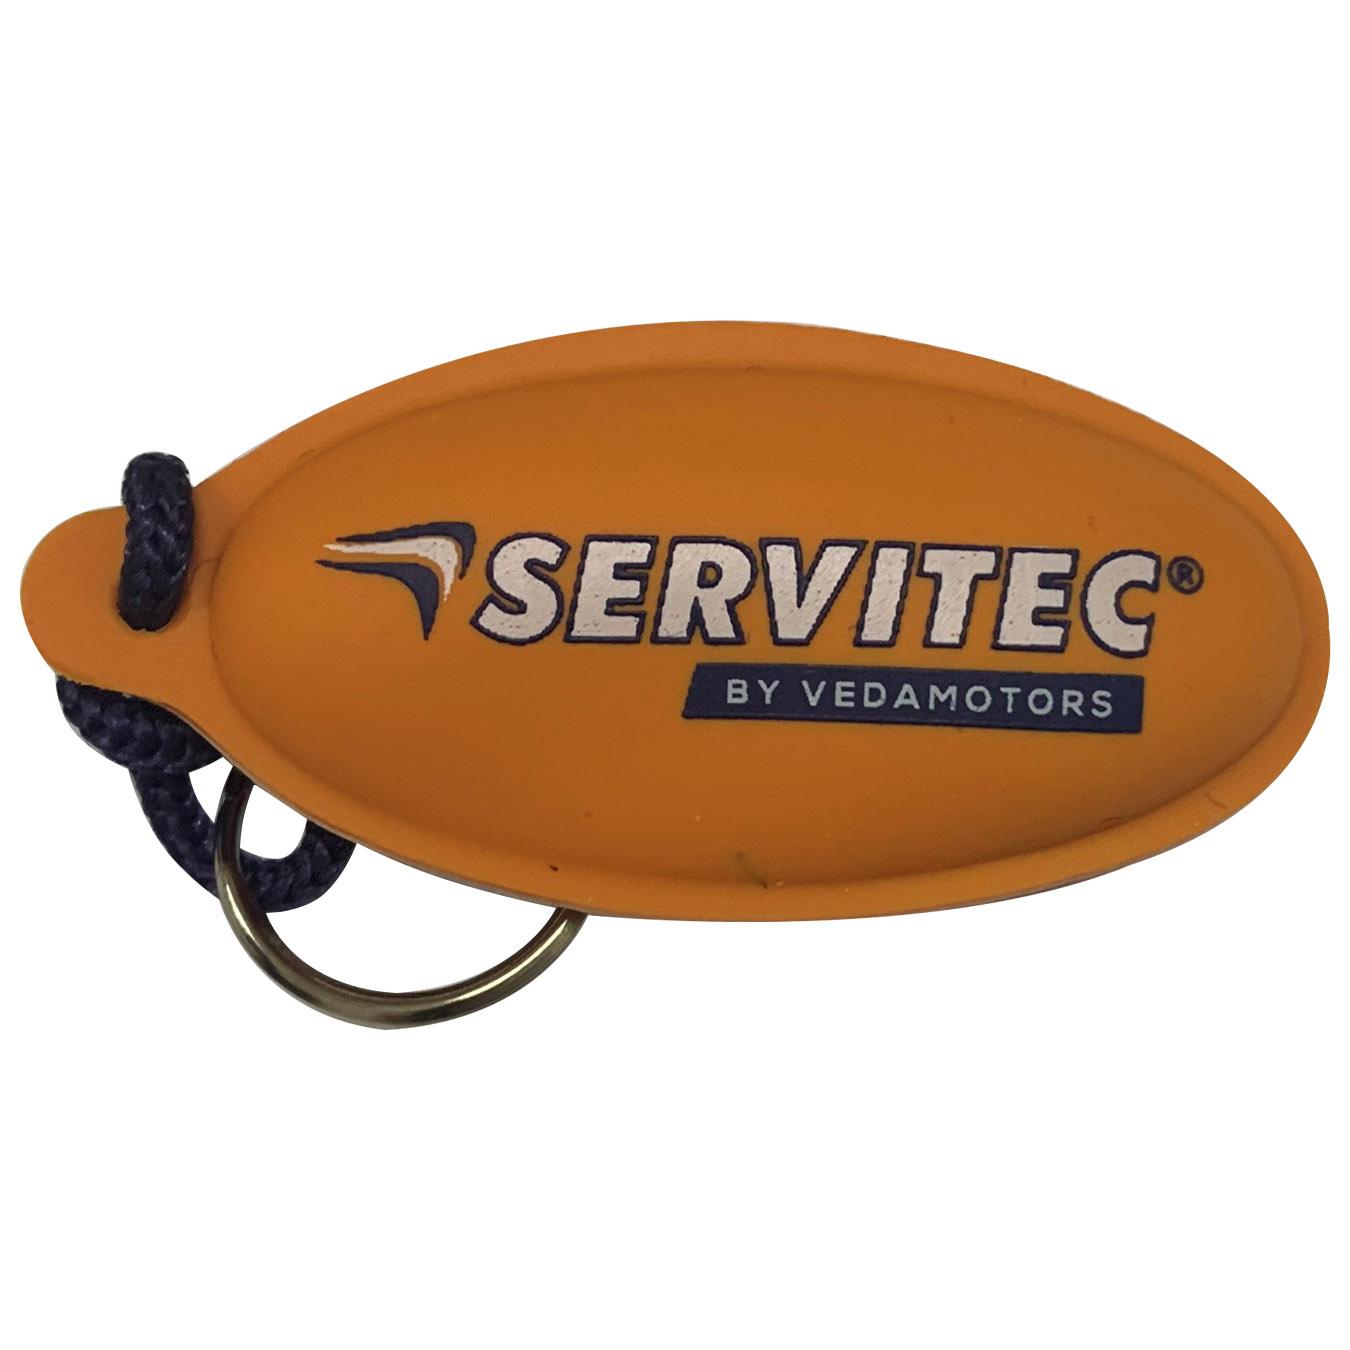 Cdi Cg150 Titan Ks/es/esd/job 2002 Até 2008 Servitec